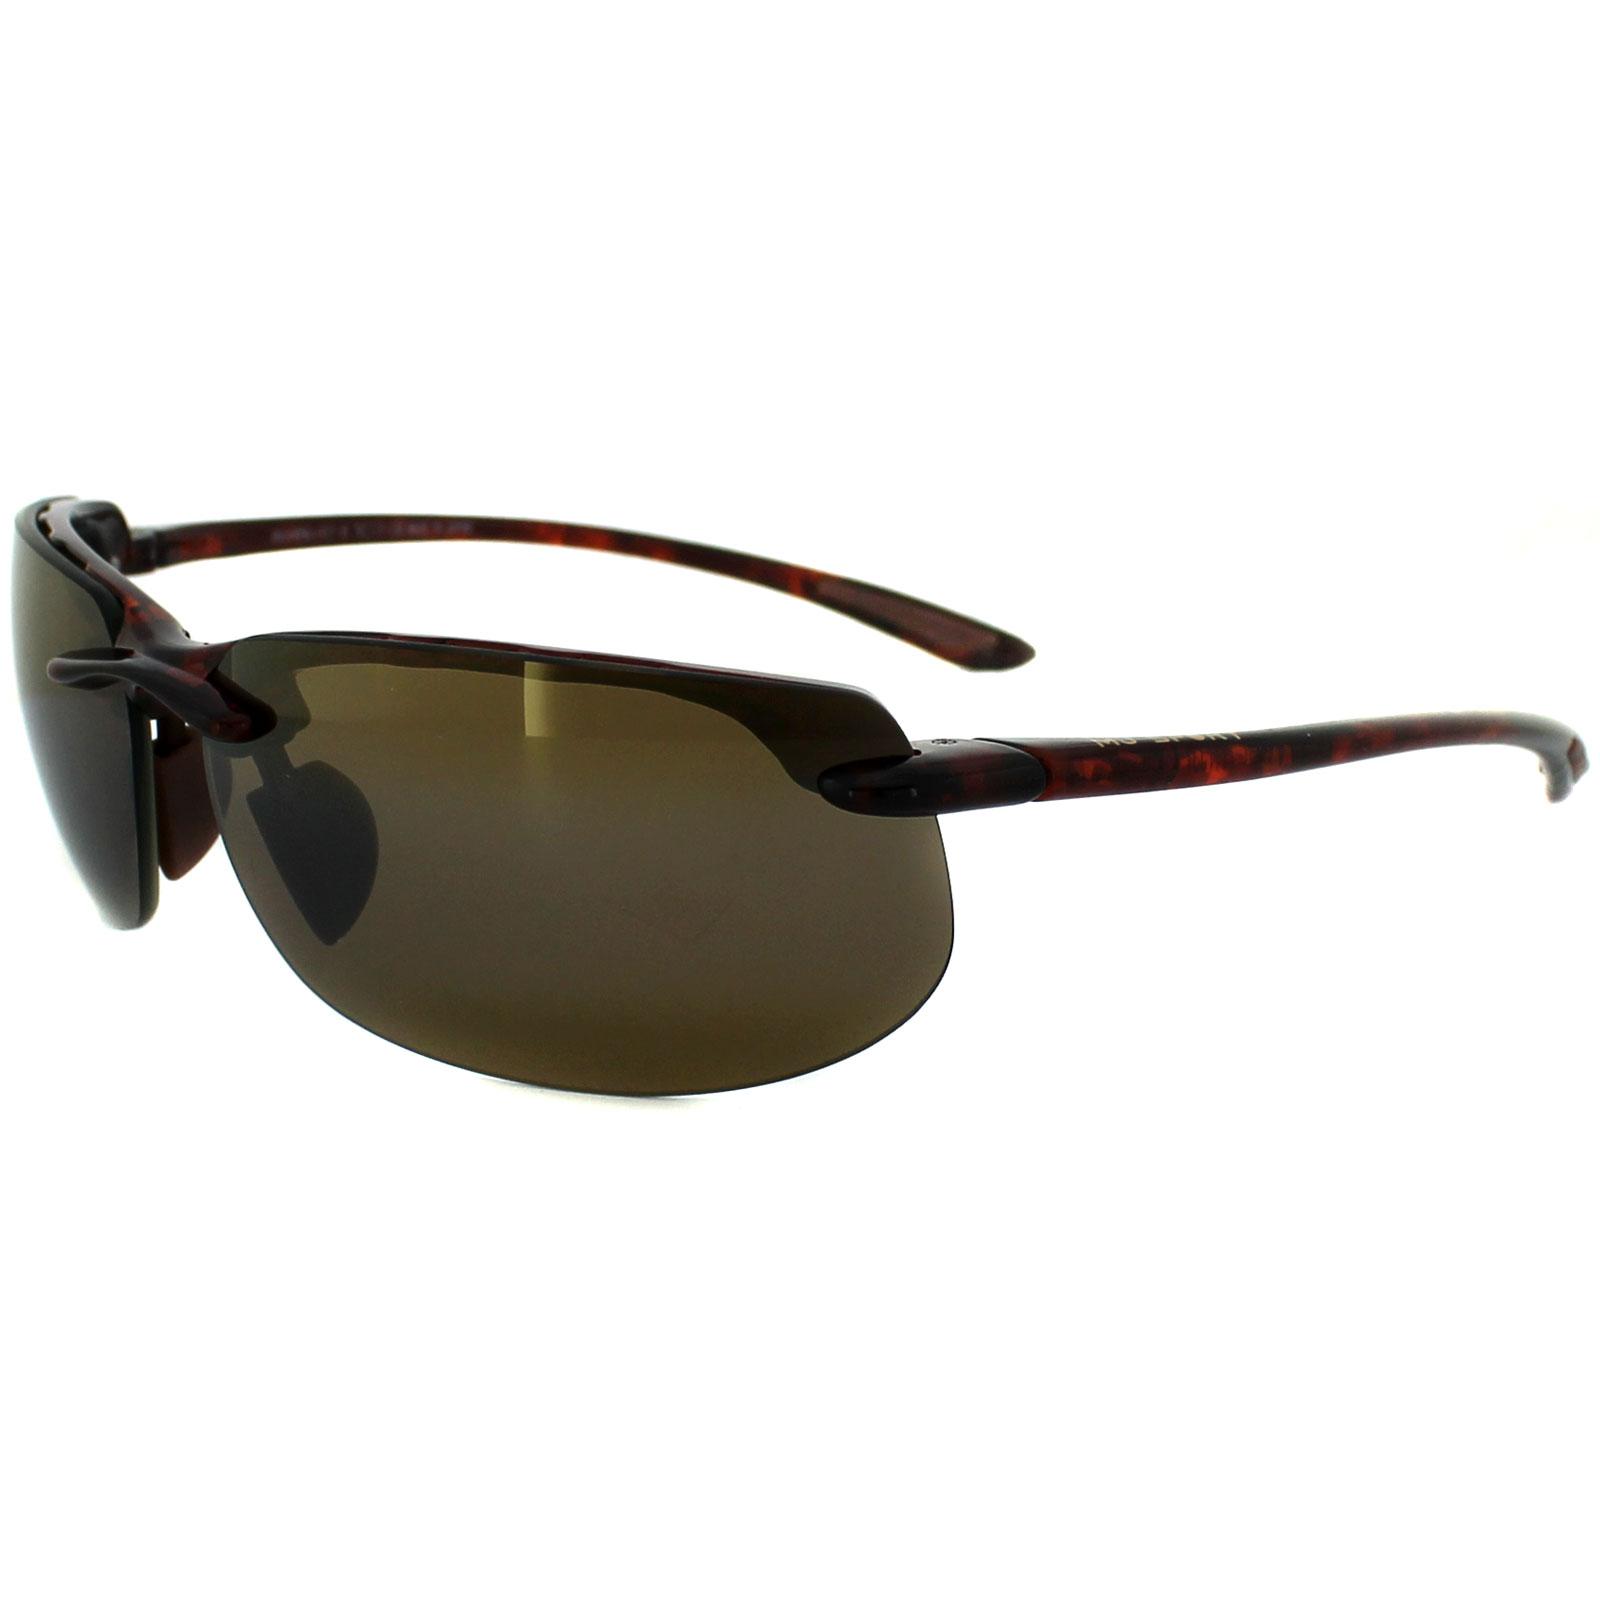 Maui Jim Sunglasses Guarantee  maui jim sunglasses banyans h412 10 tortoise bronze polarized ebay